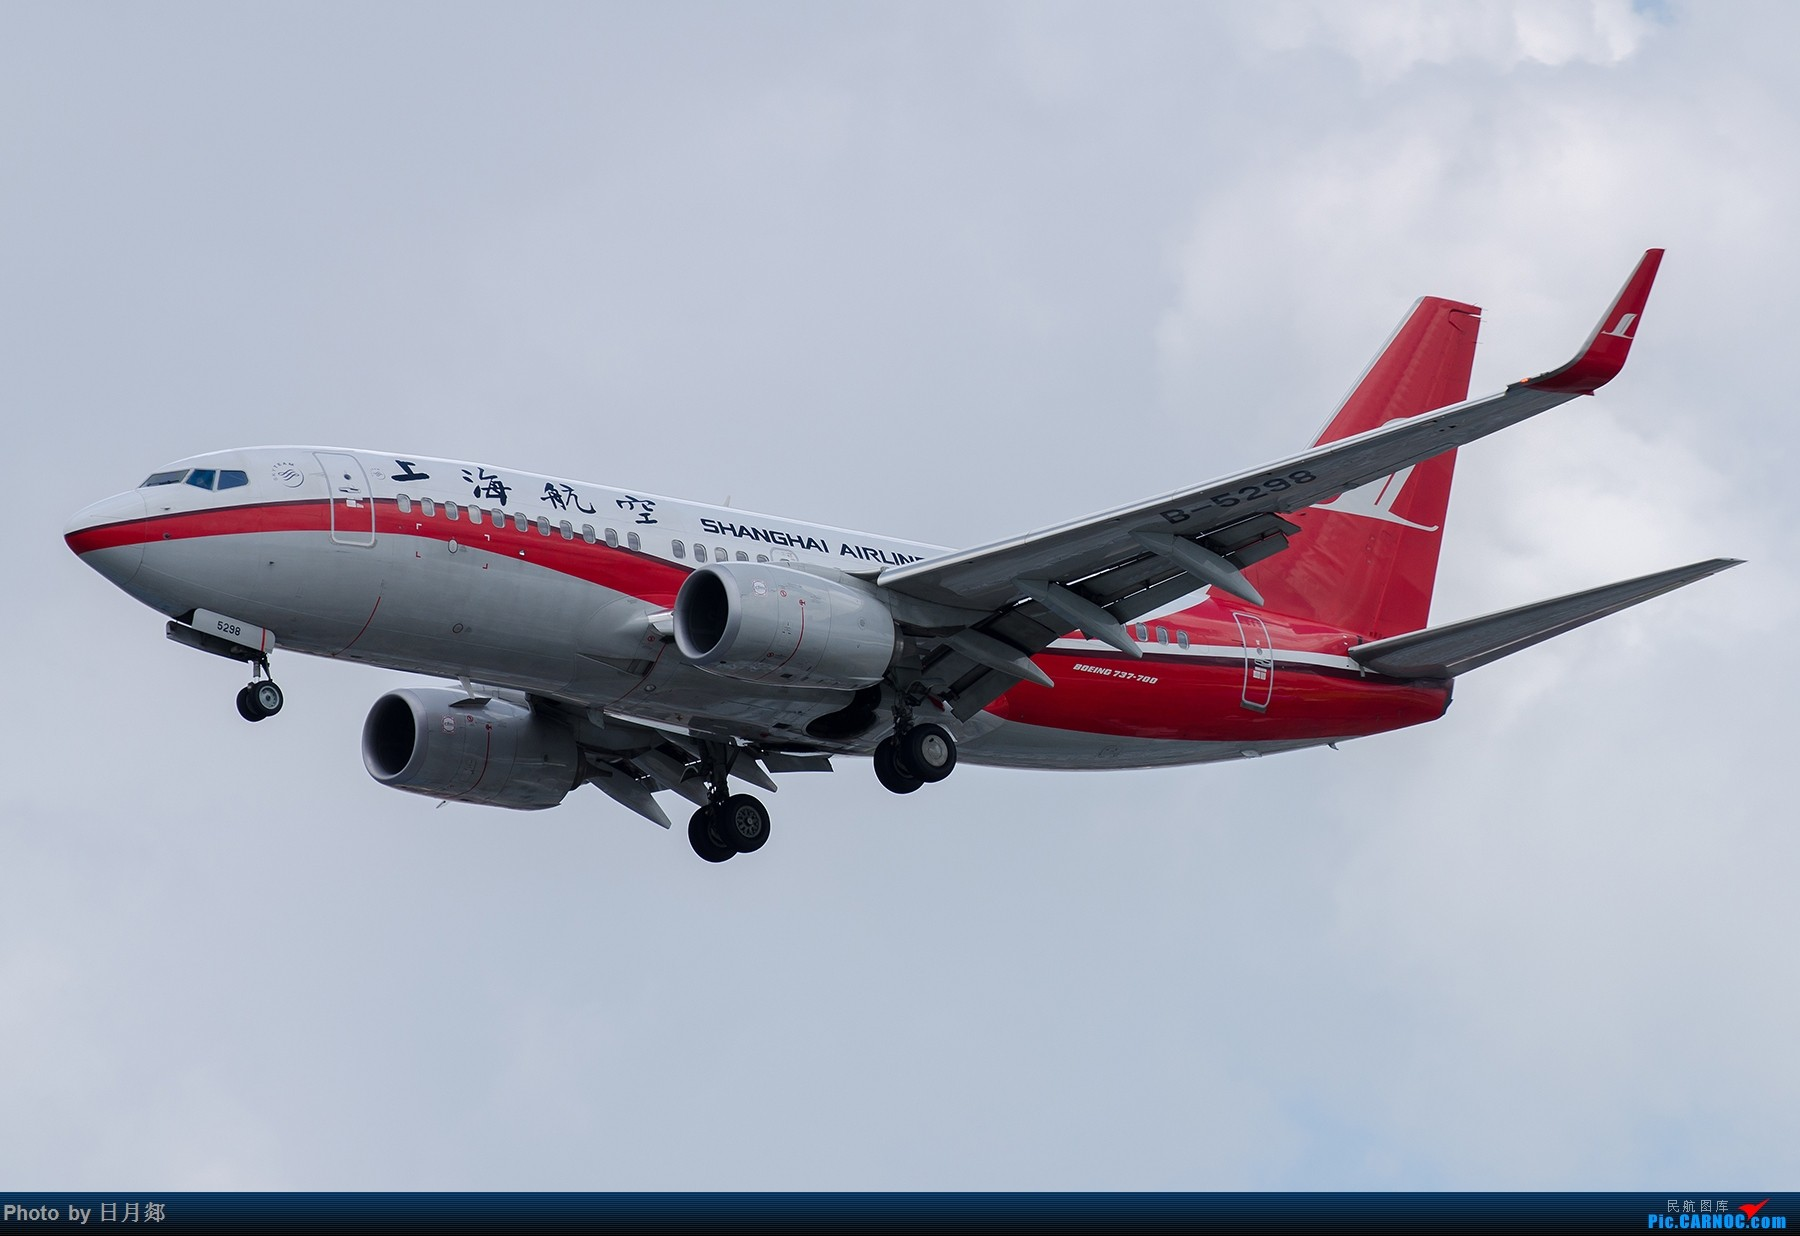 Re:[原创]【SHA拍机*1800大图】图要抓紧发,不然就要炒冷饭,大头镇贴 BOEING 737-700 B-5298 中国上海虹桥国际机场